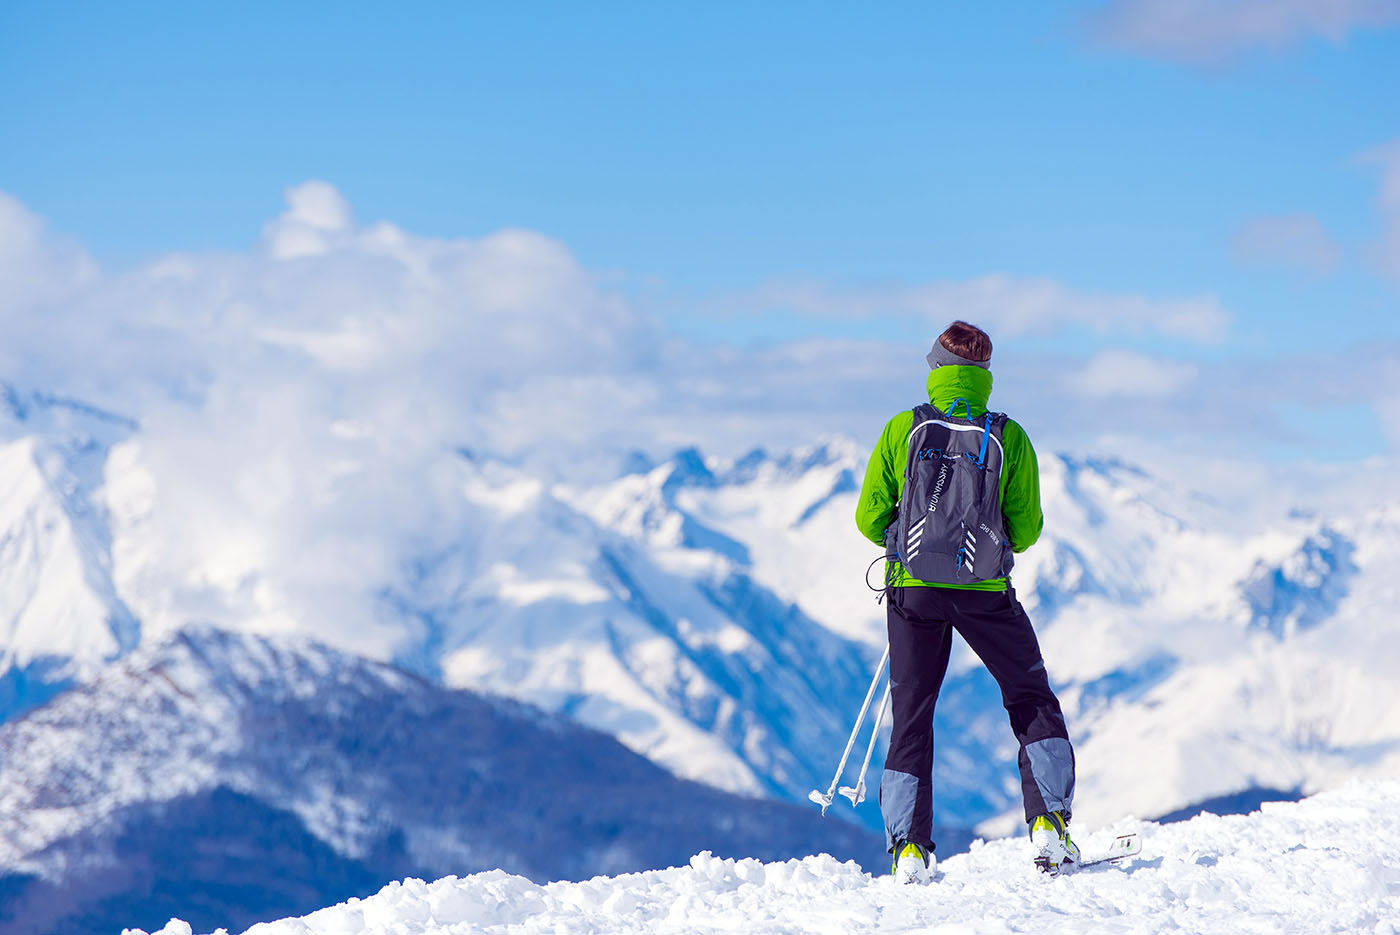 prep for winter sports